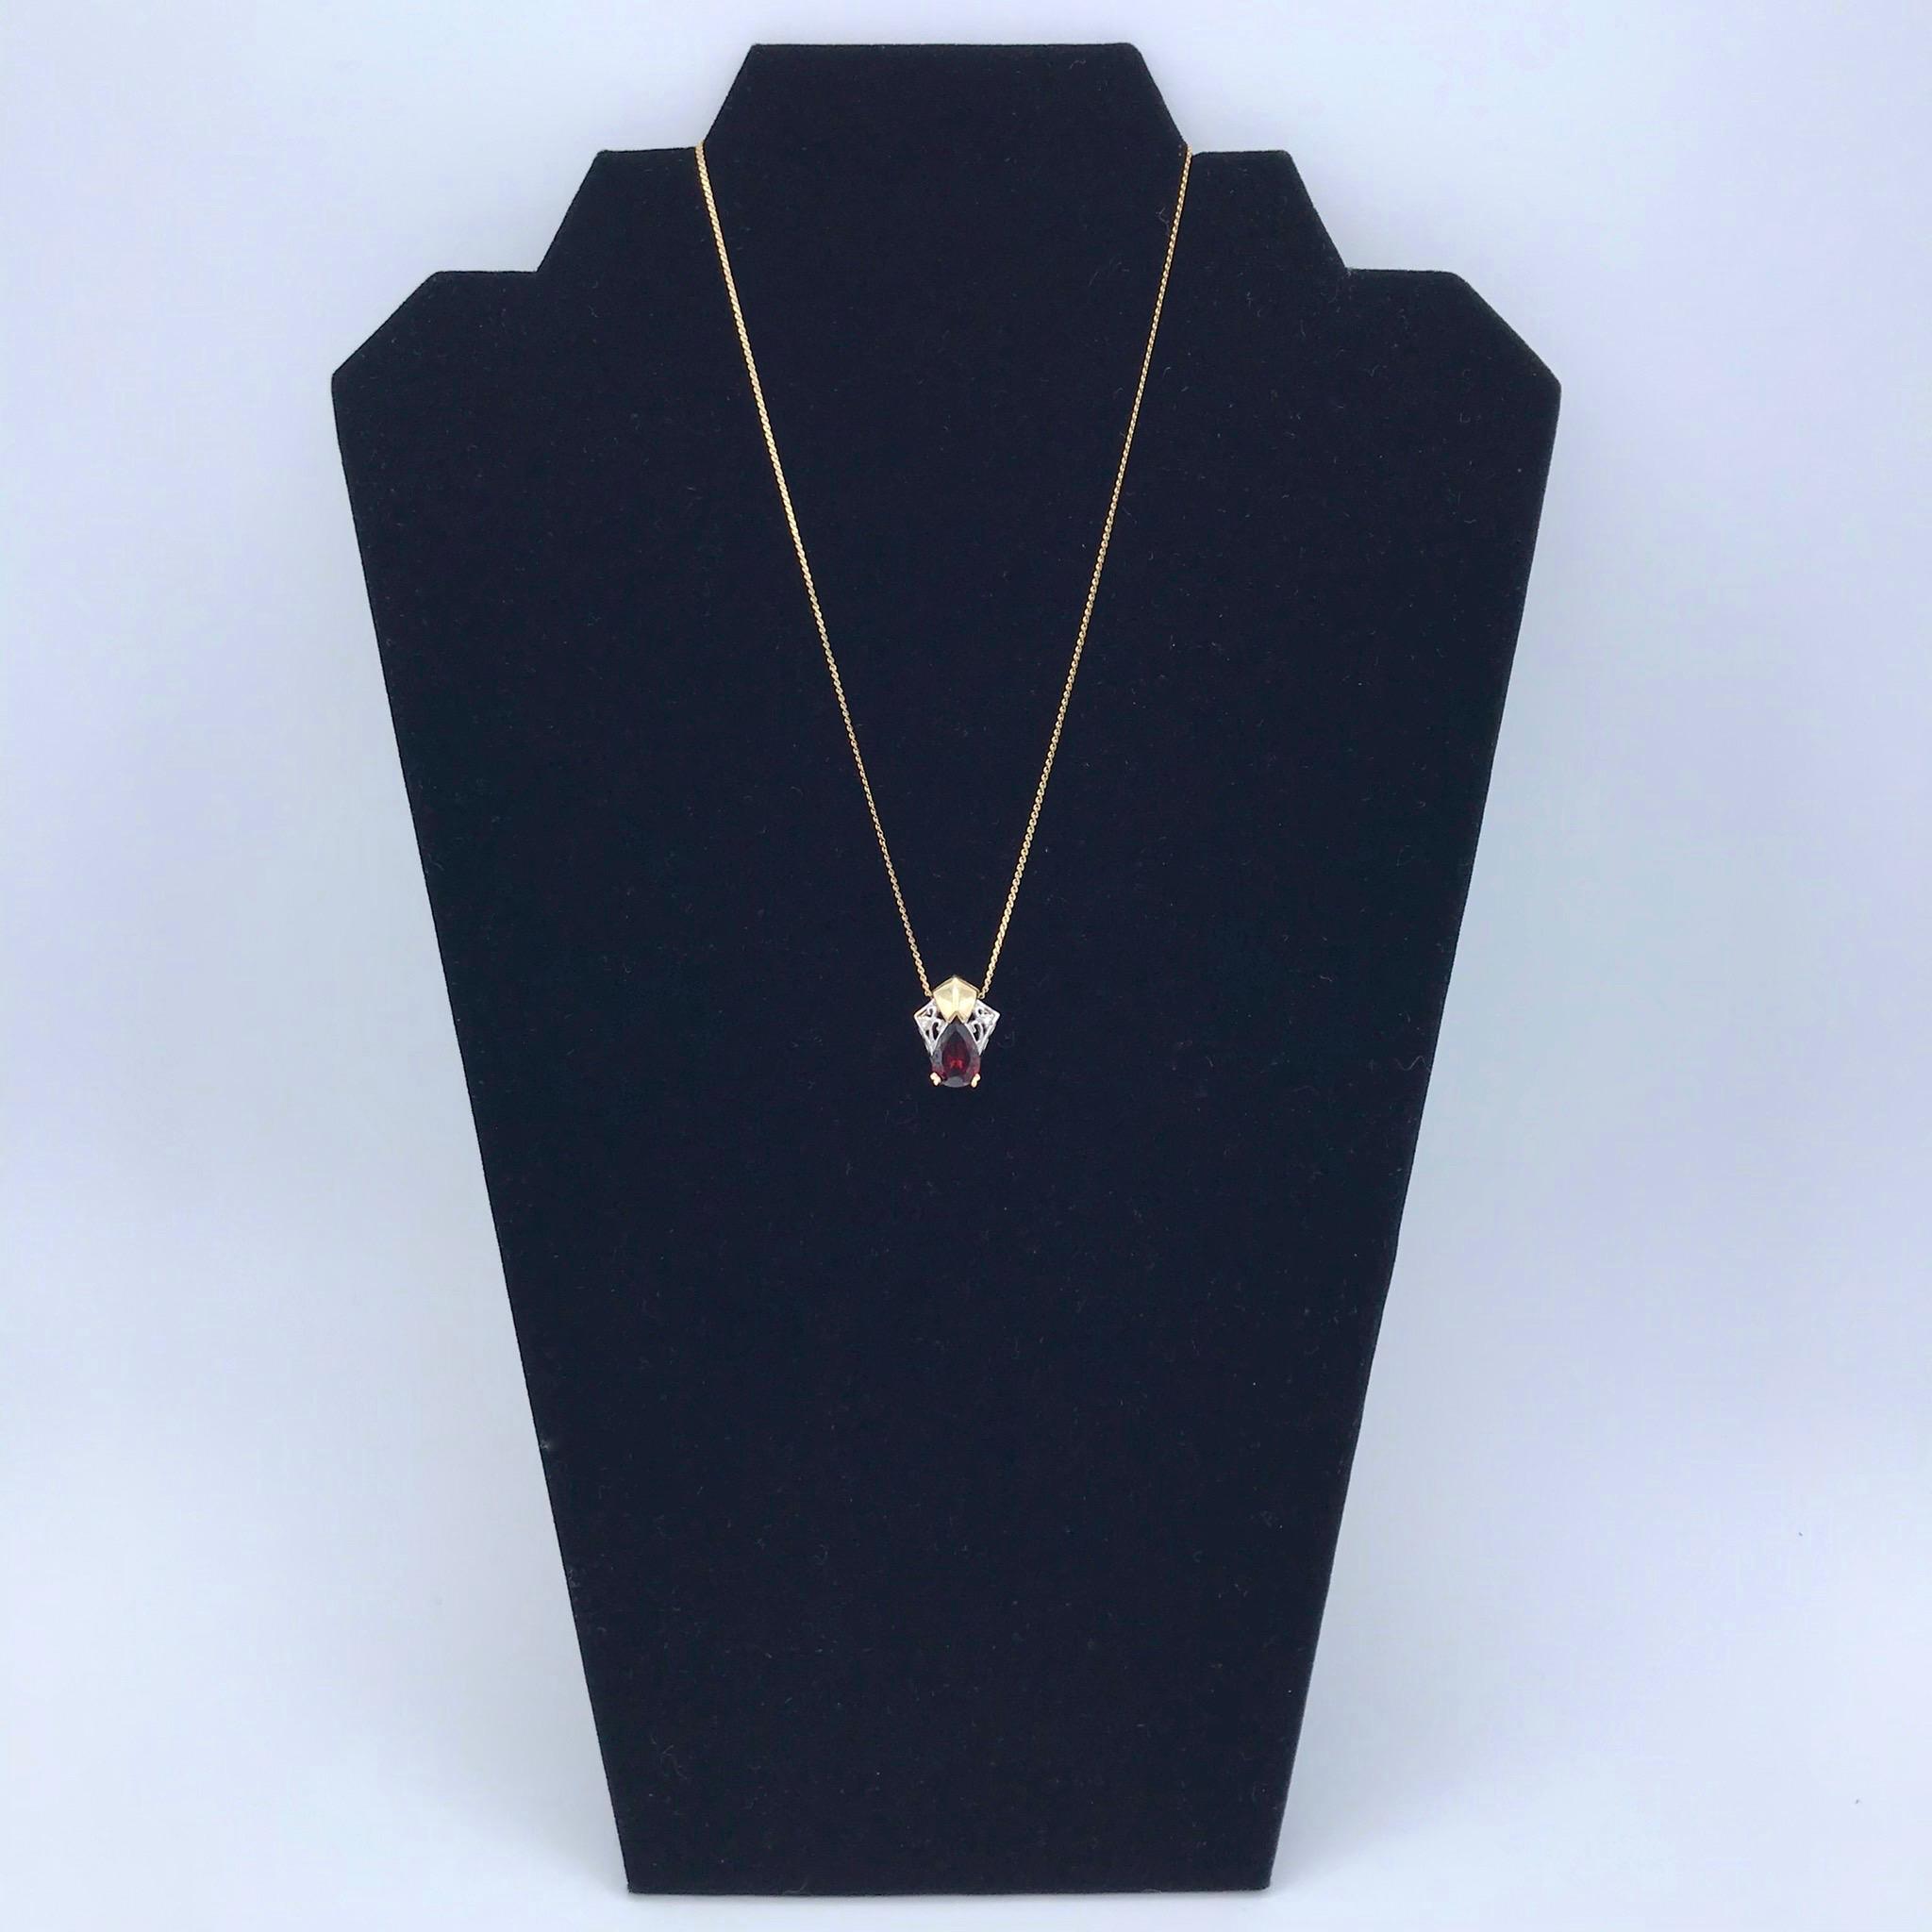 14kt Gold, Garnet & Diamond Pendant